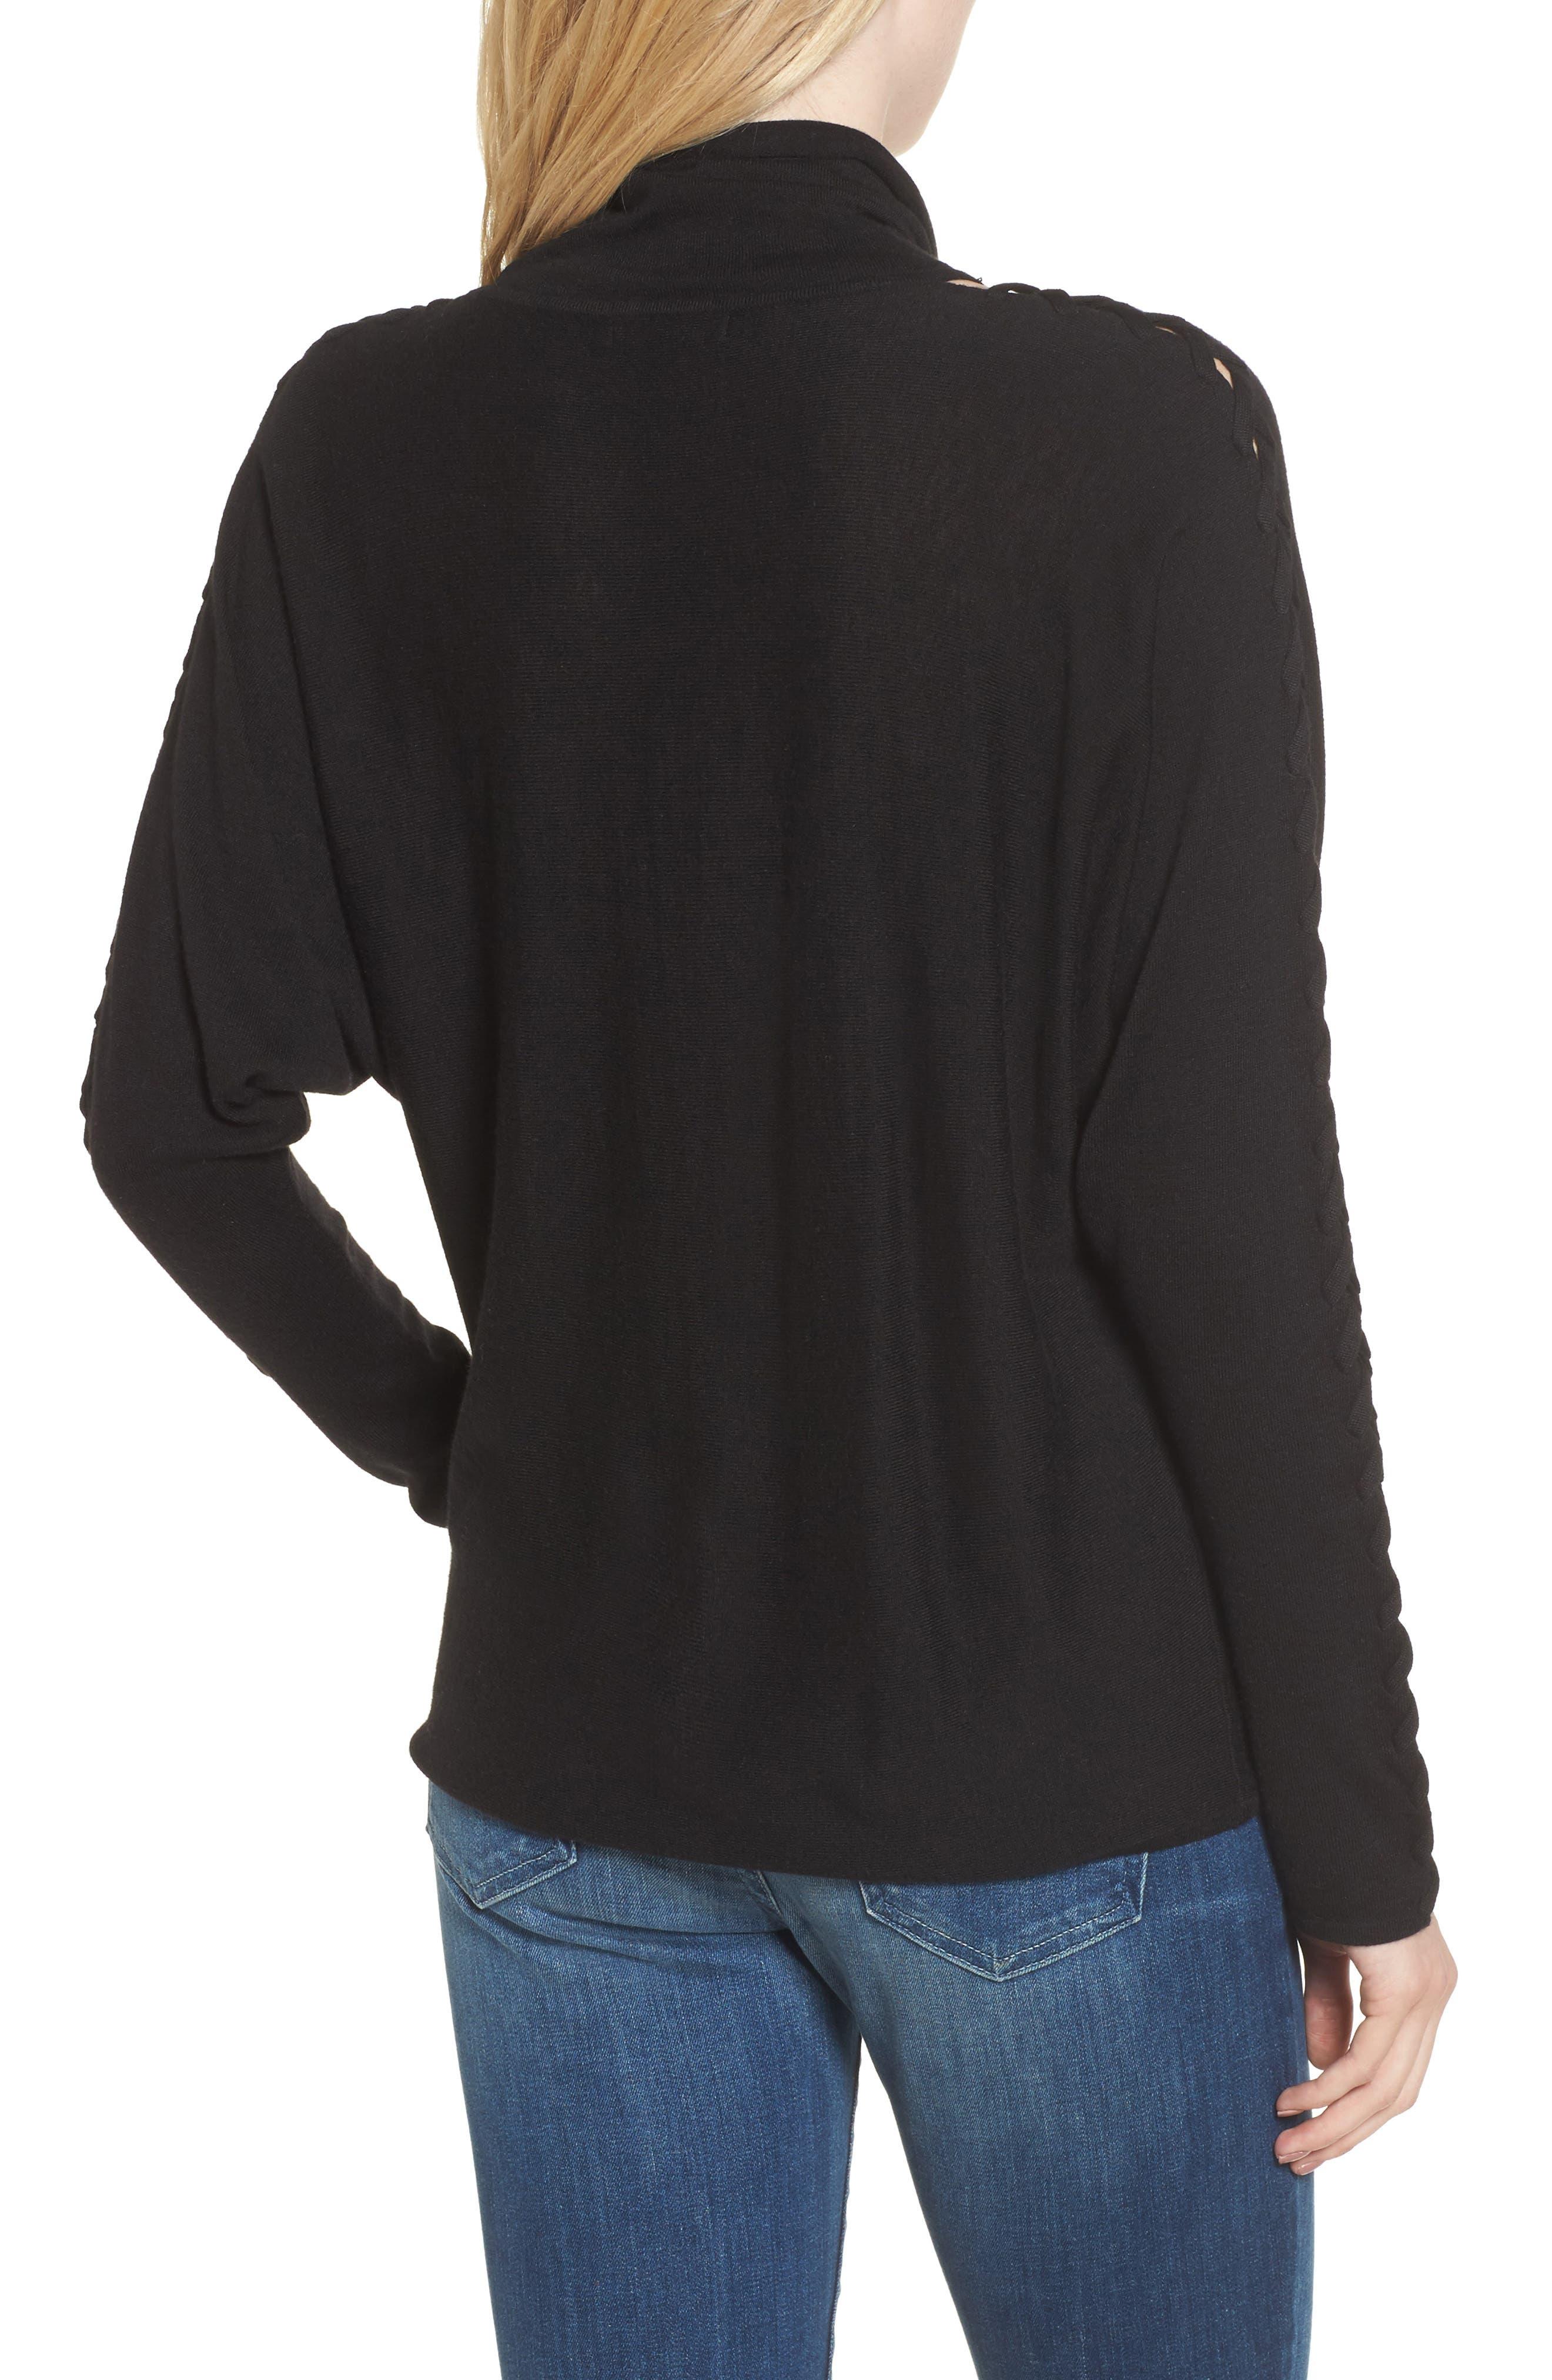 Victoire Turtleneck Sweater,                             Alternate thumbnail 2, color,                             Black